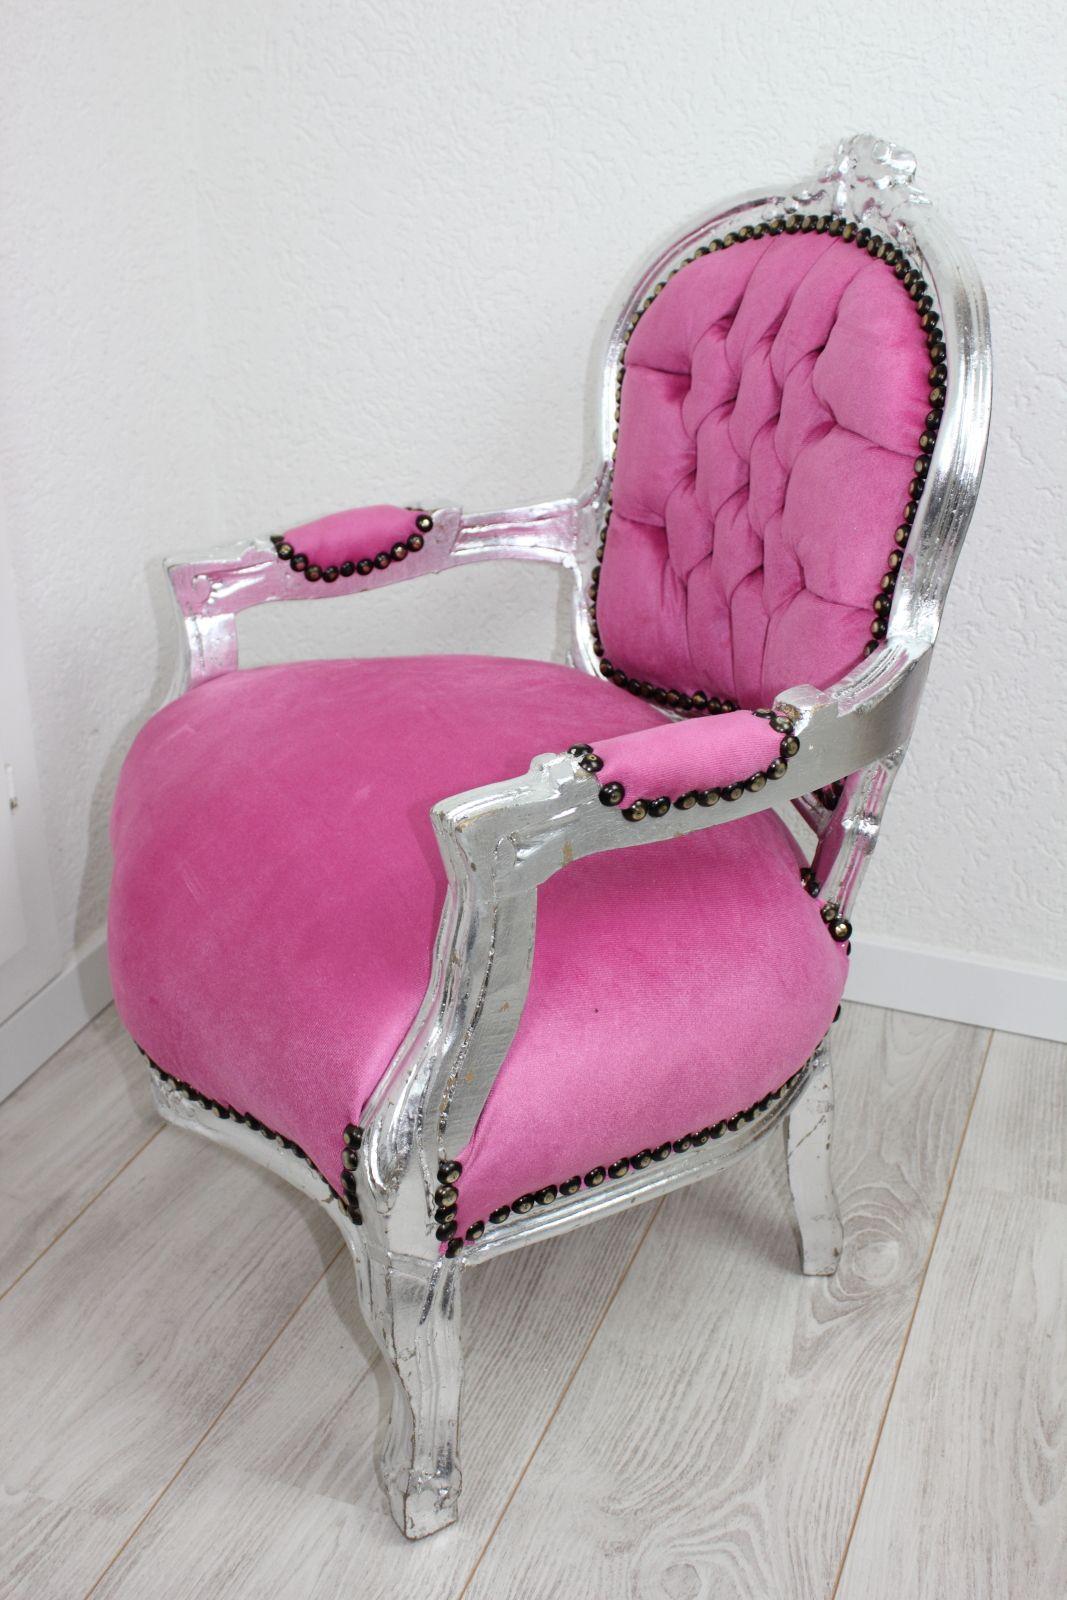 kinderstuhl barock stuhl prinzessinnenstuhl rosa antik. Black Bedroom Furniture Sets. Home Design Ideas